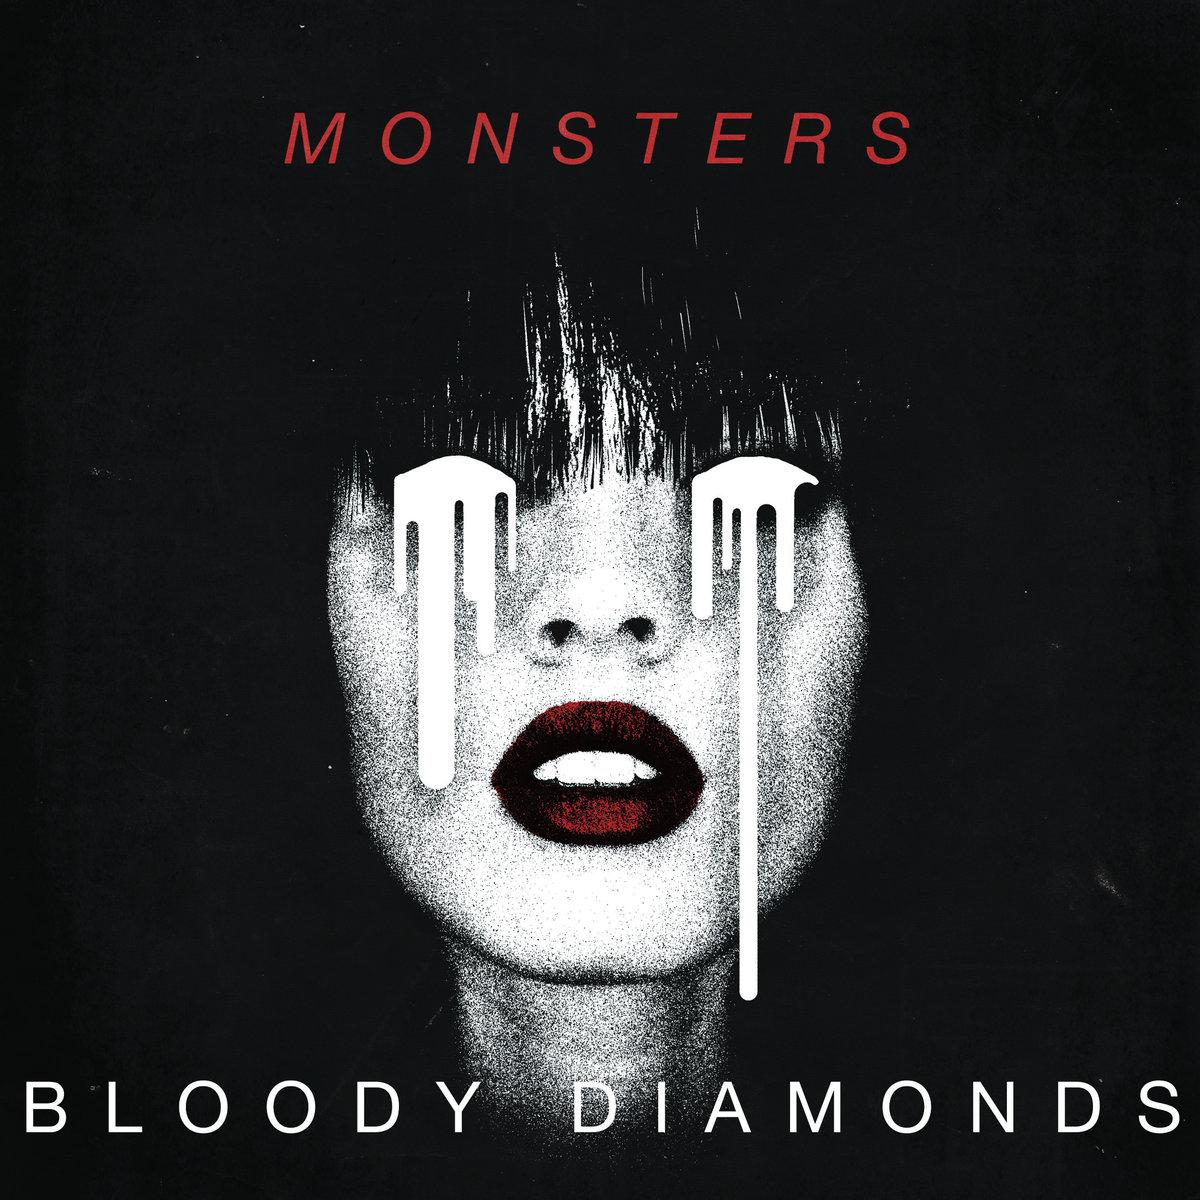 bloodydiamonds_monsters.jpg